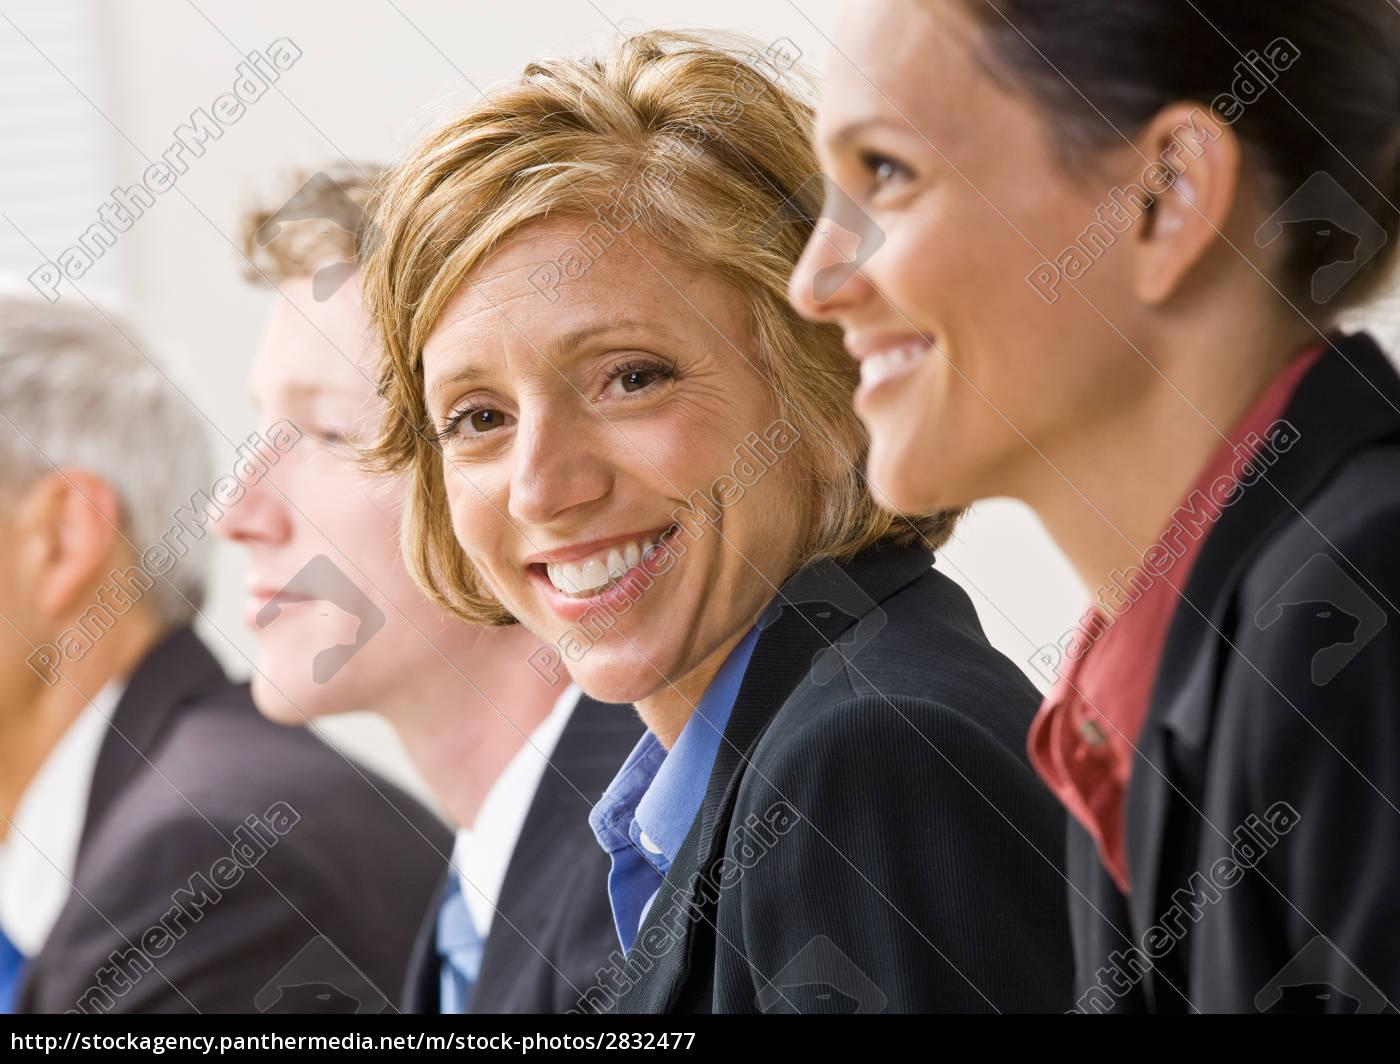 woman, close, humans, human beings, people, folk - 2832477